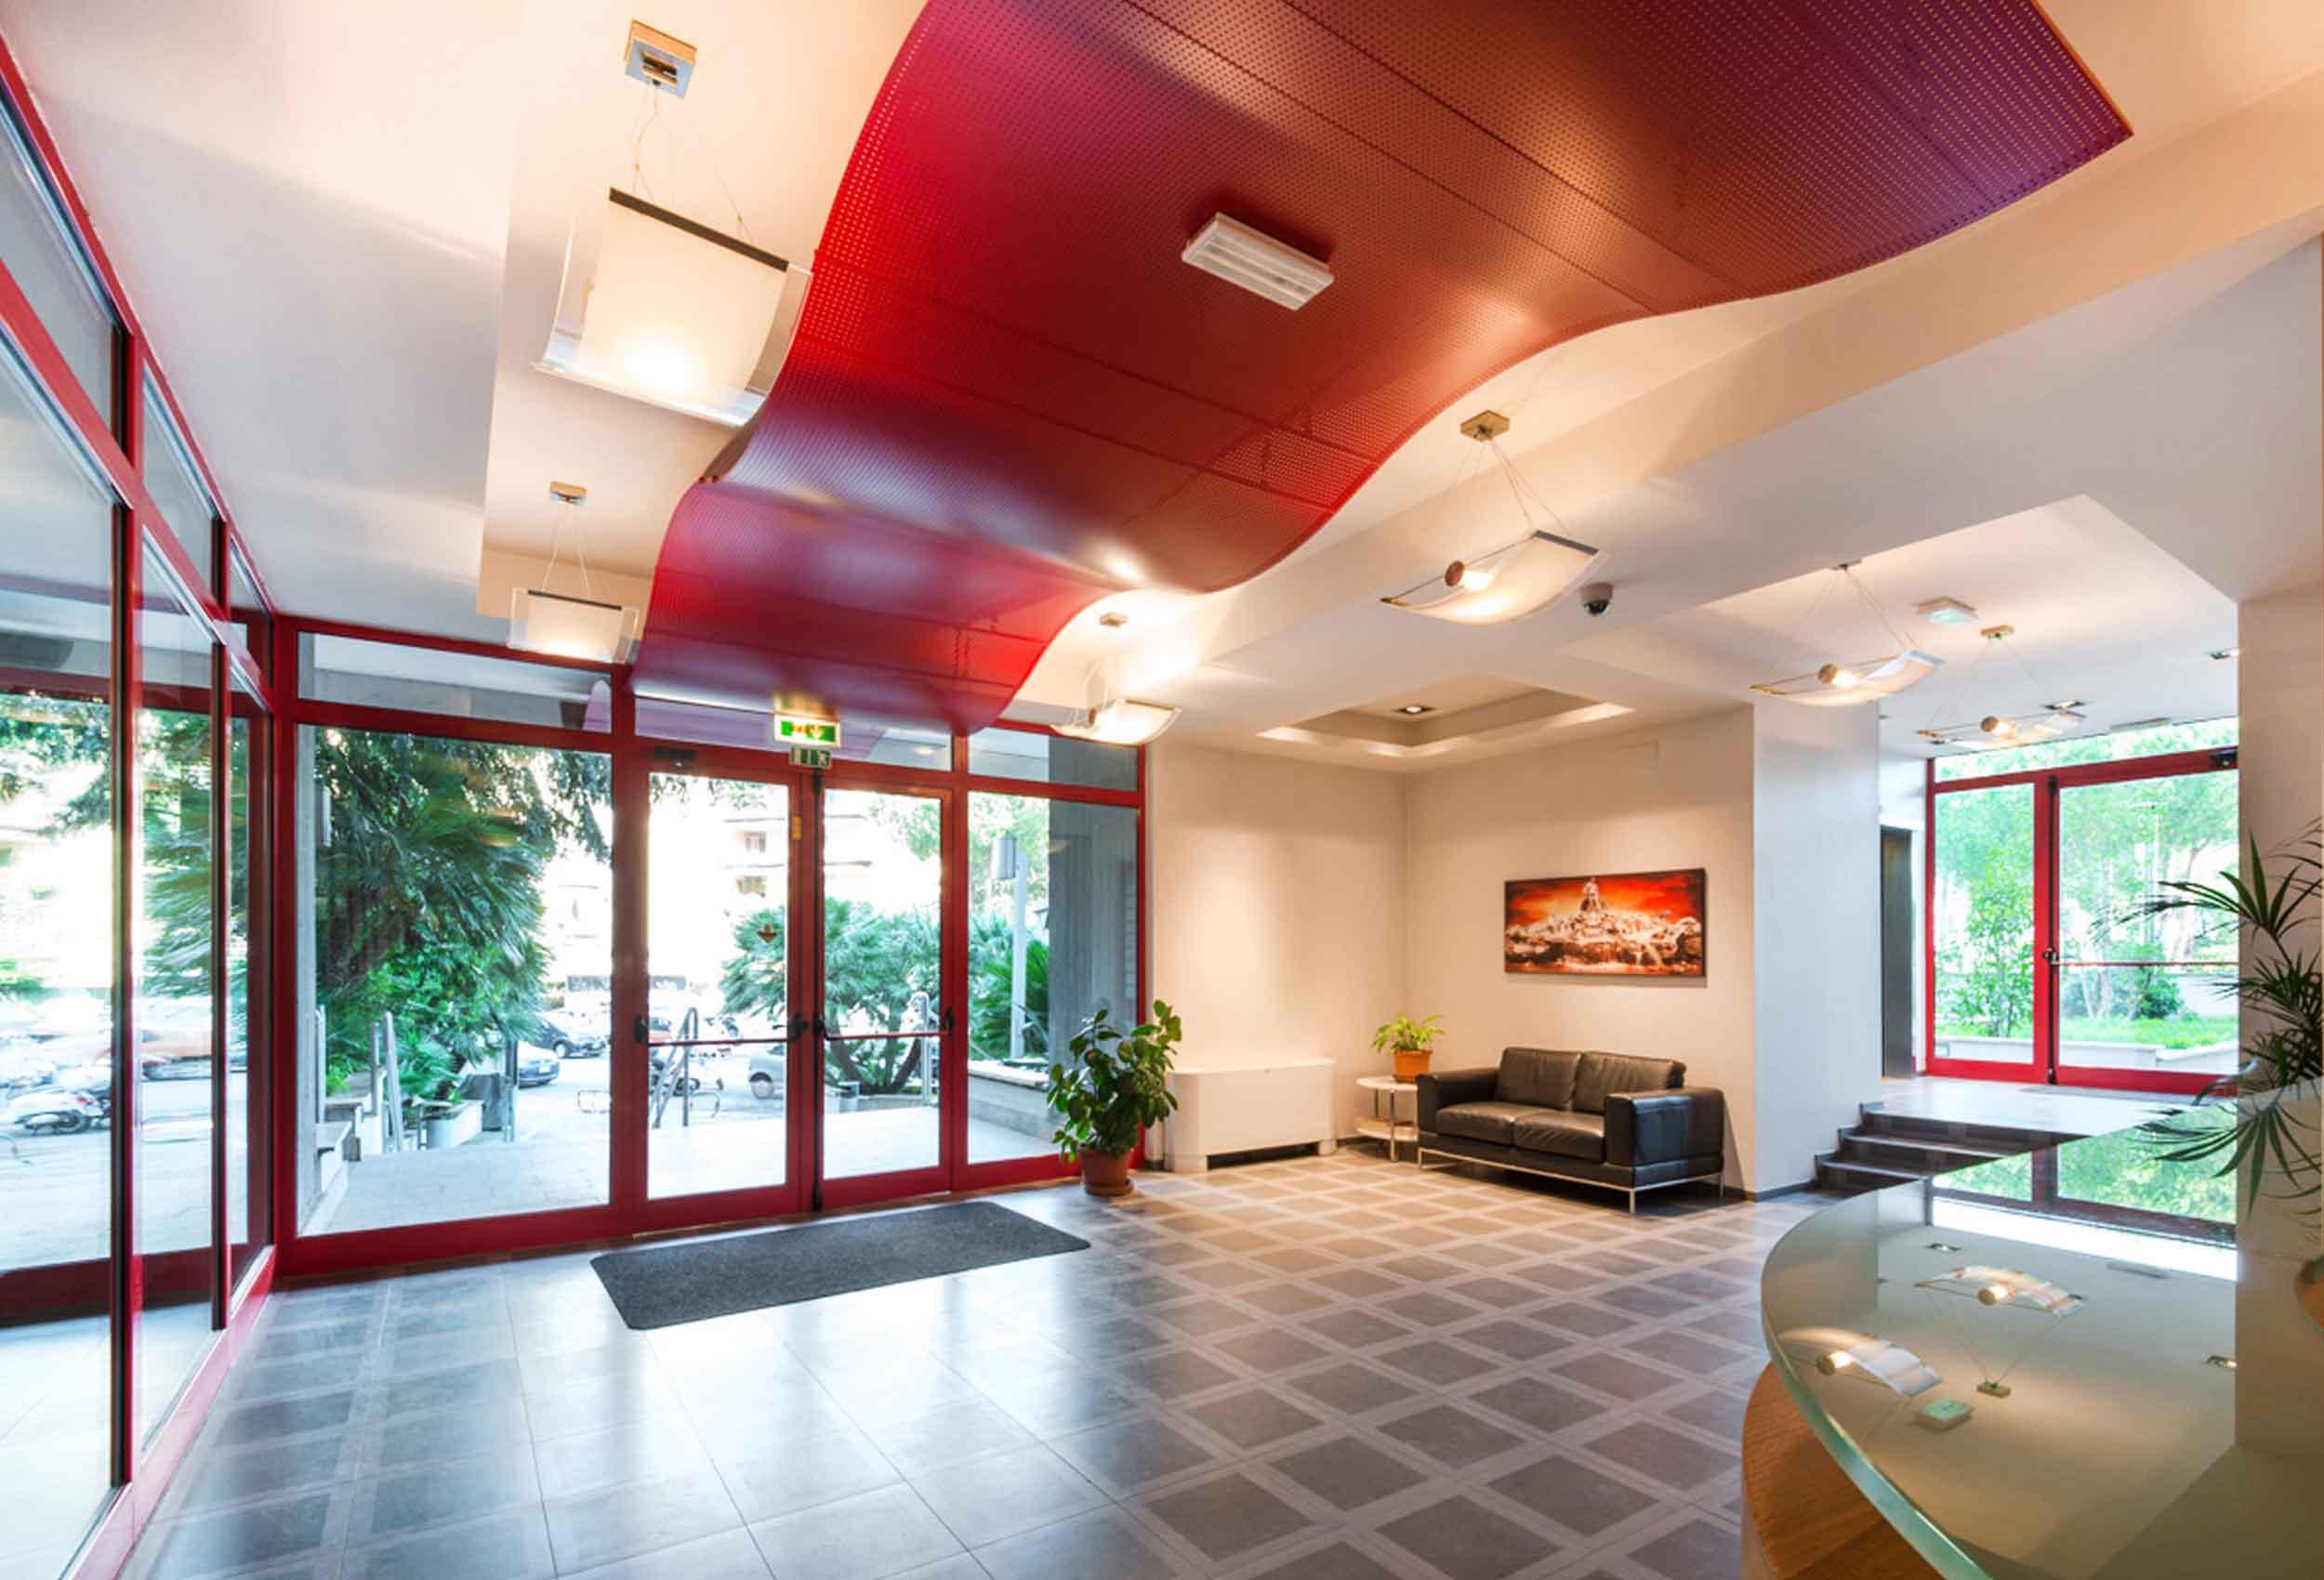 studio-architettura-hotel-roma1